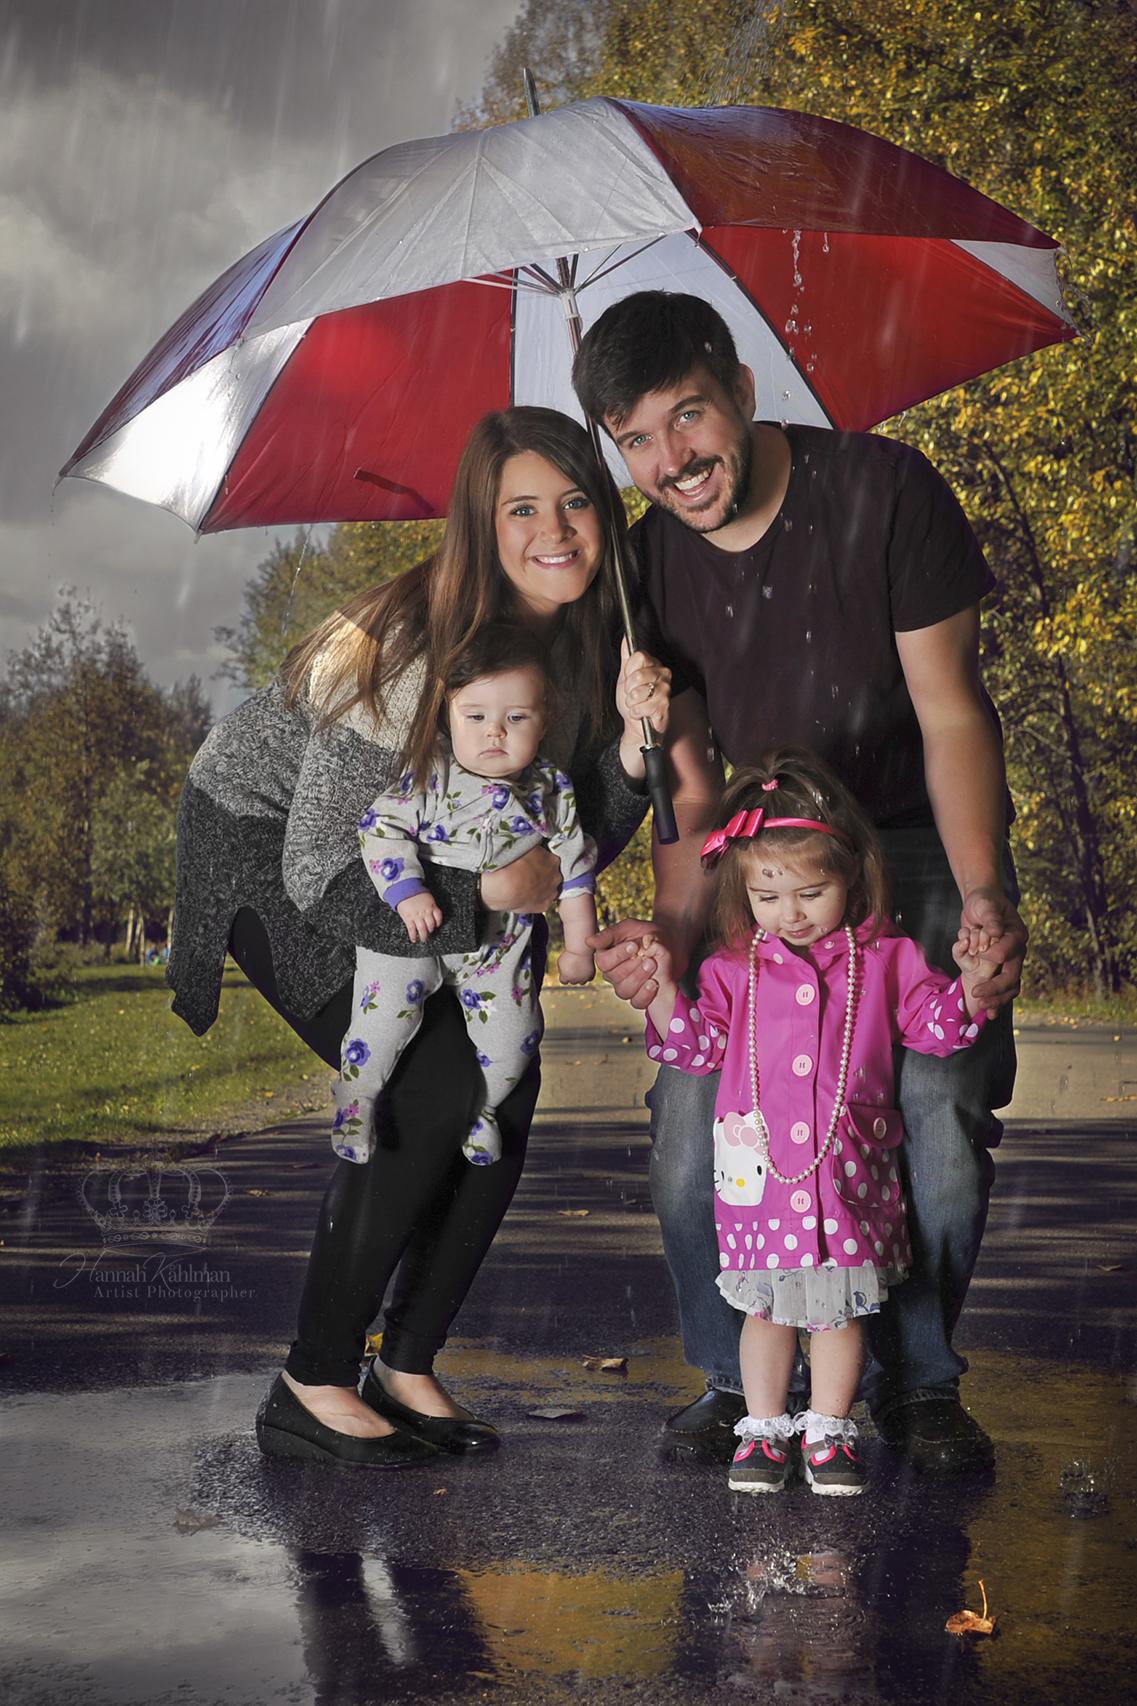 Family_in_rain_creative_outdoor_composit